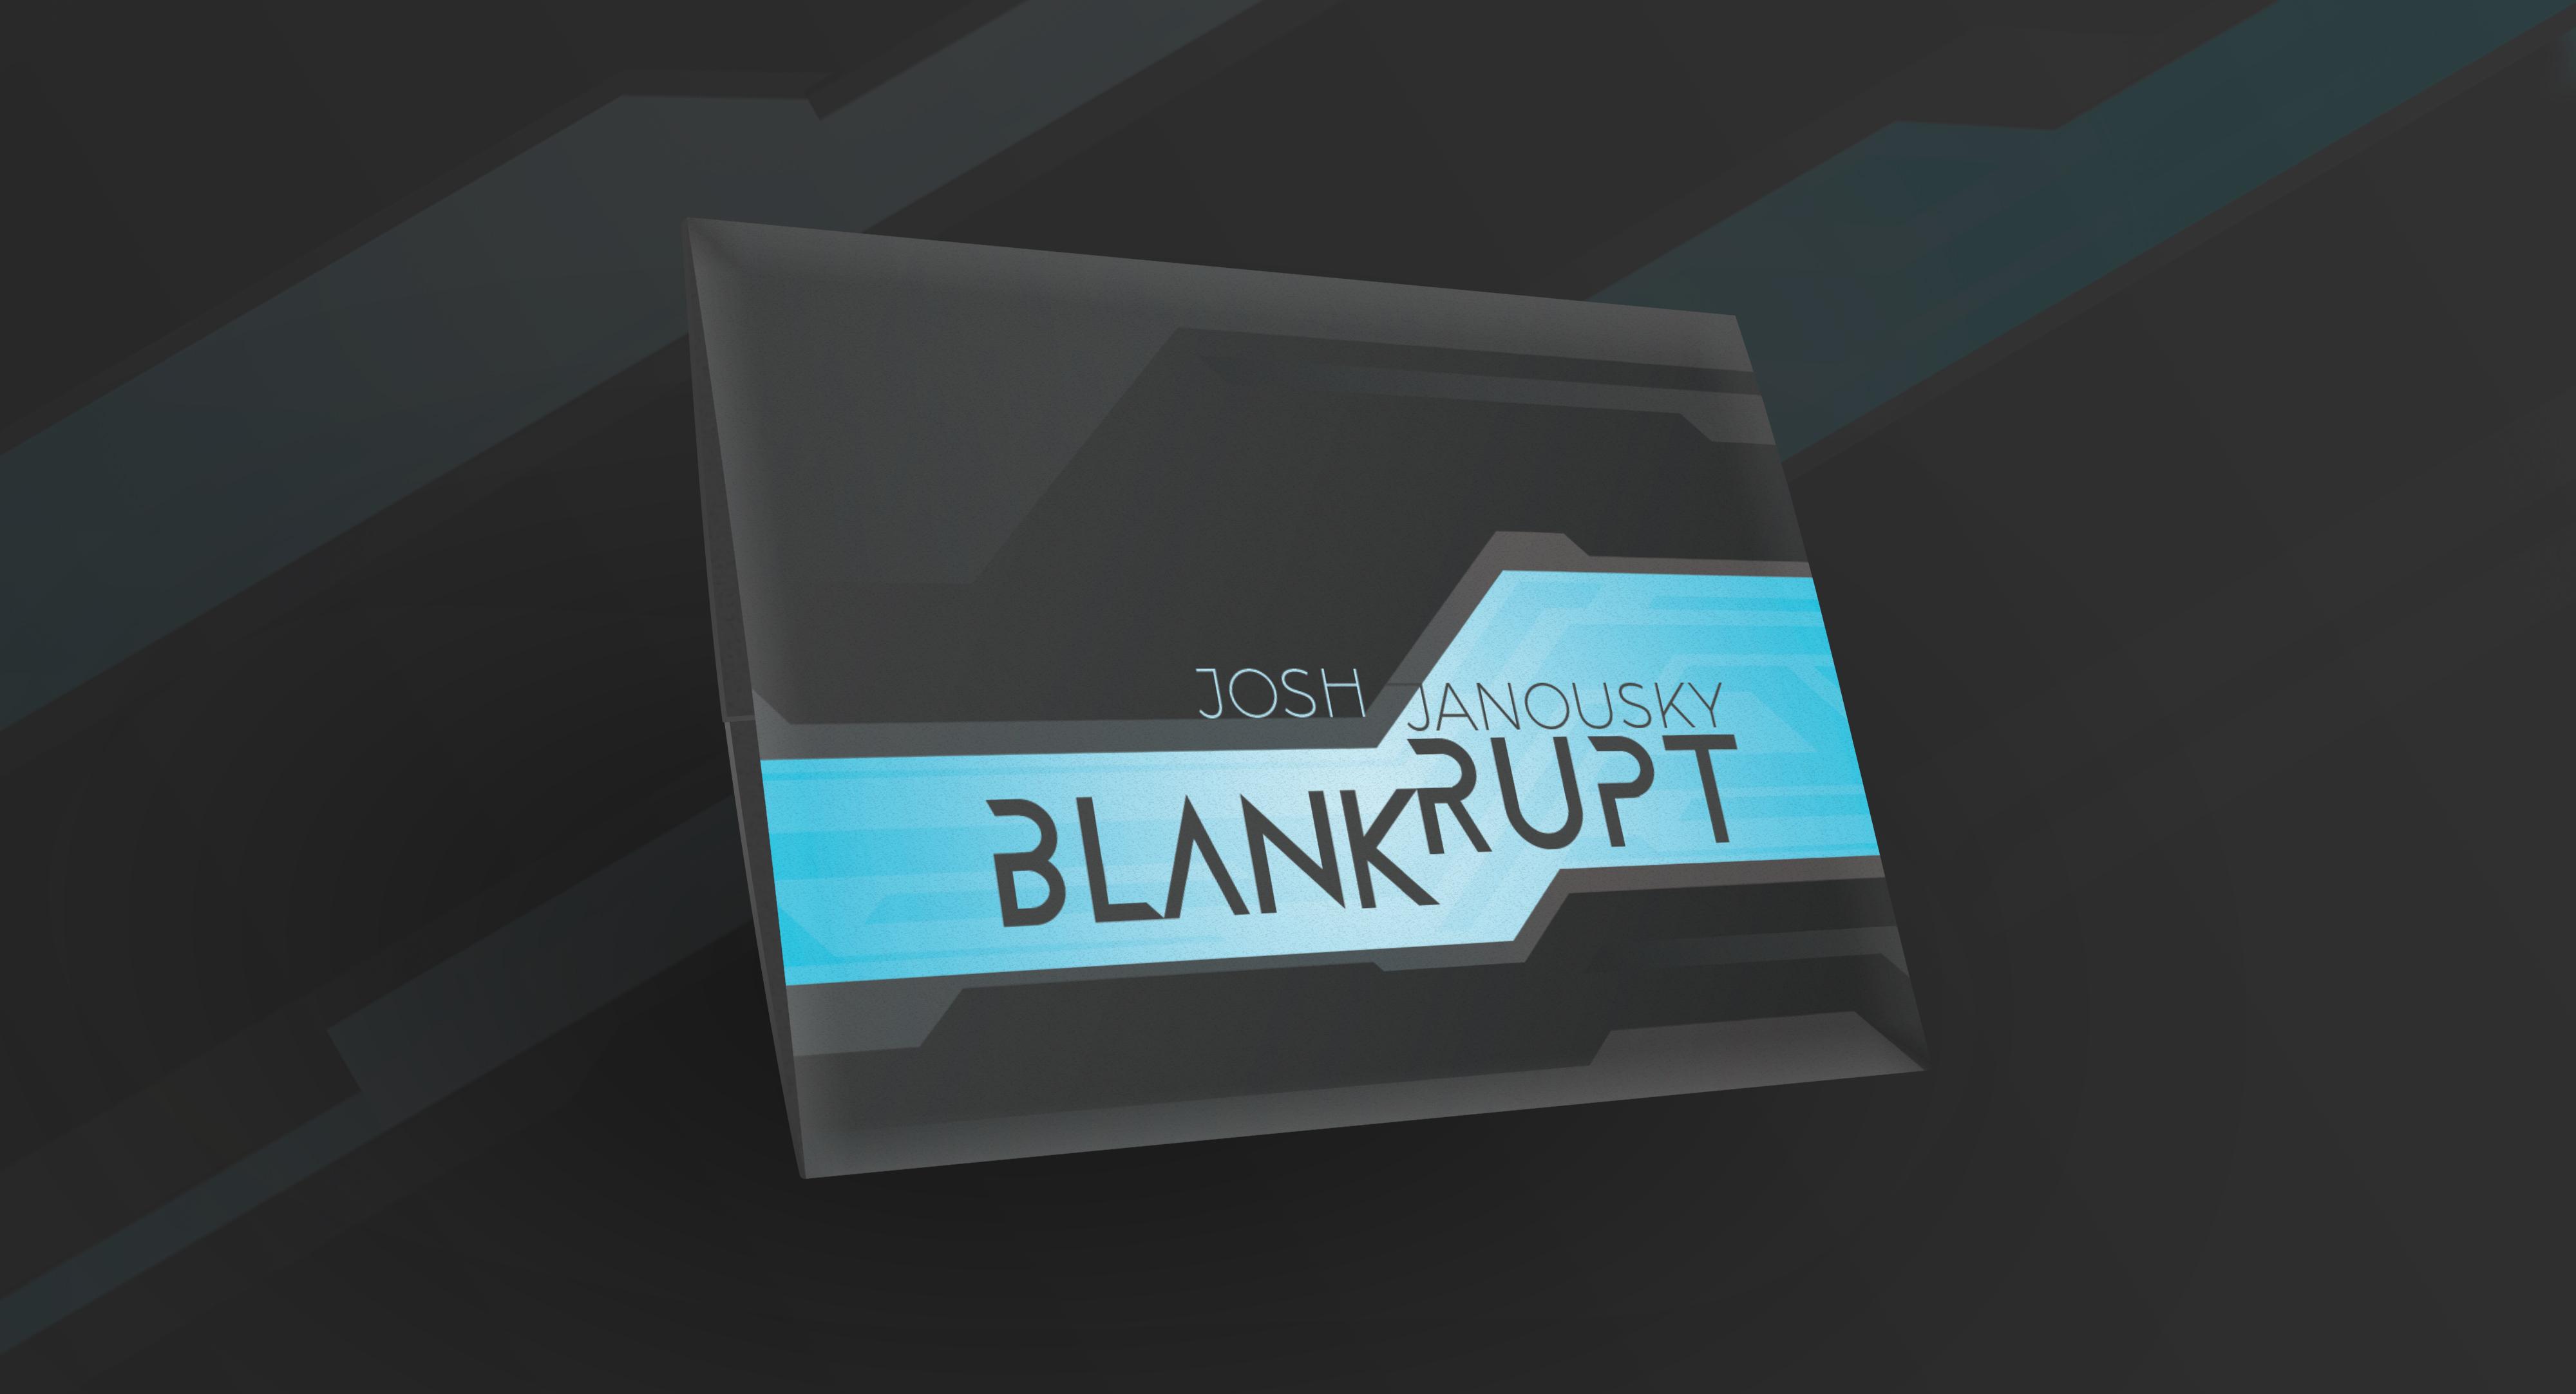 Blankrupt - magic